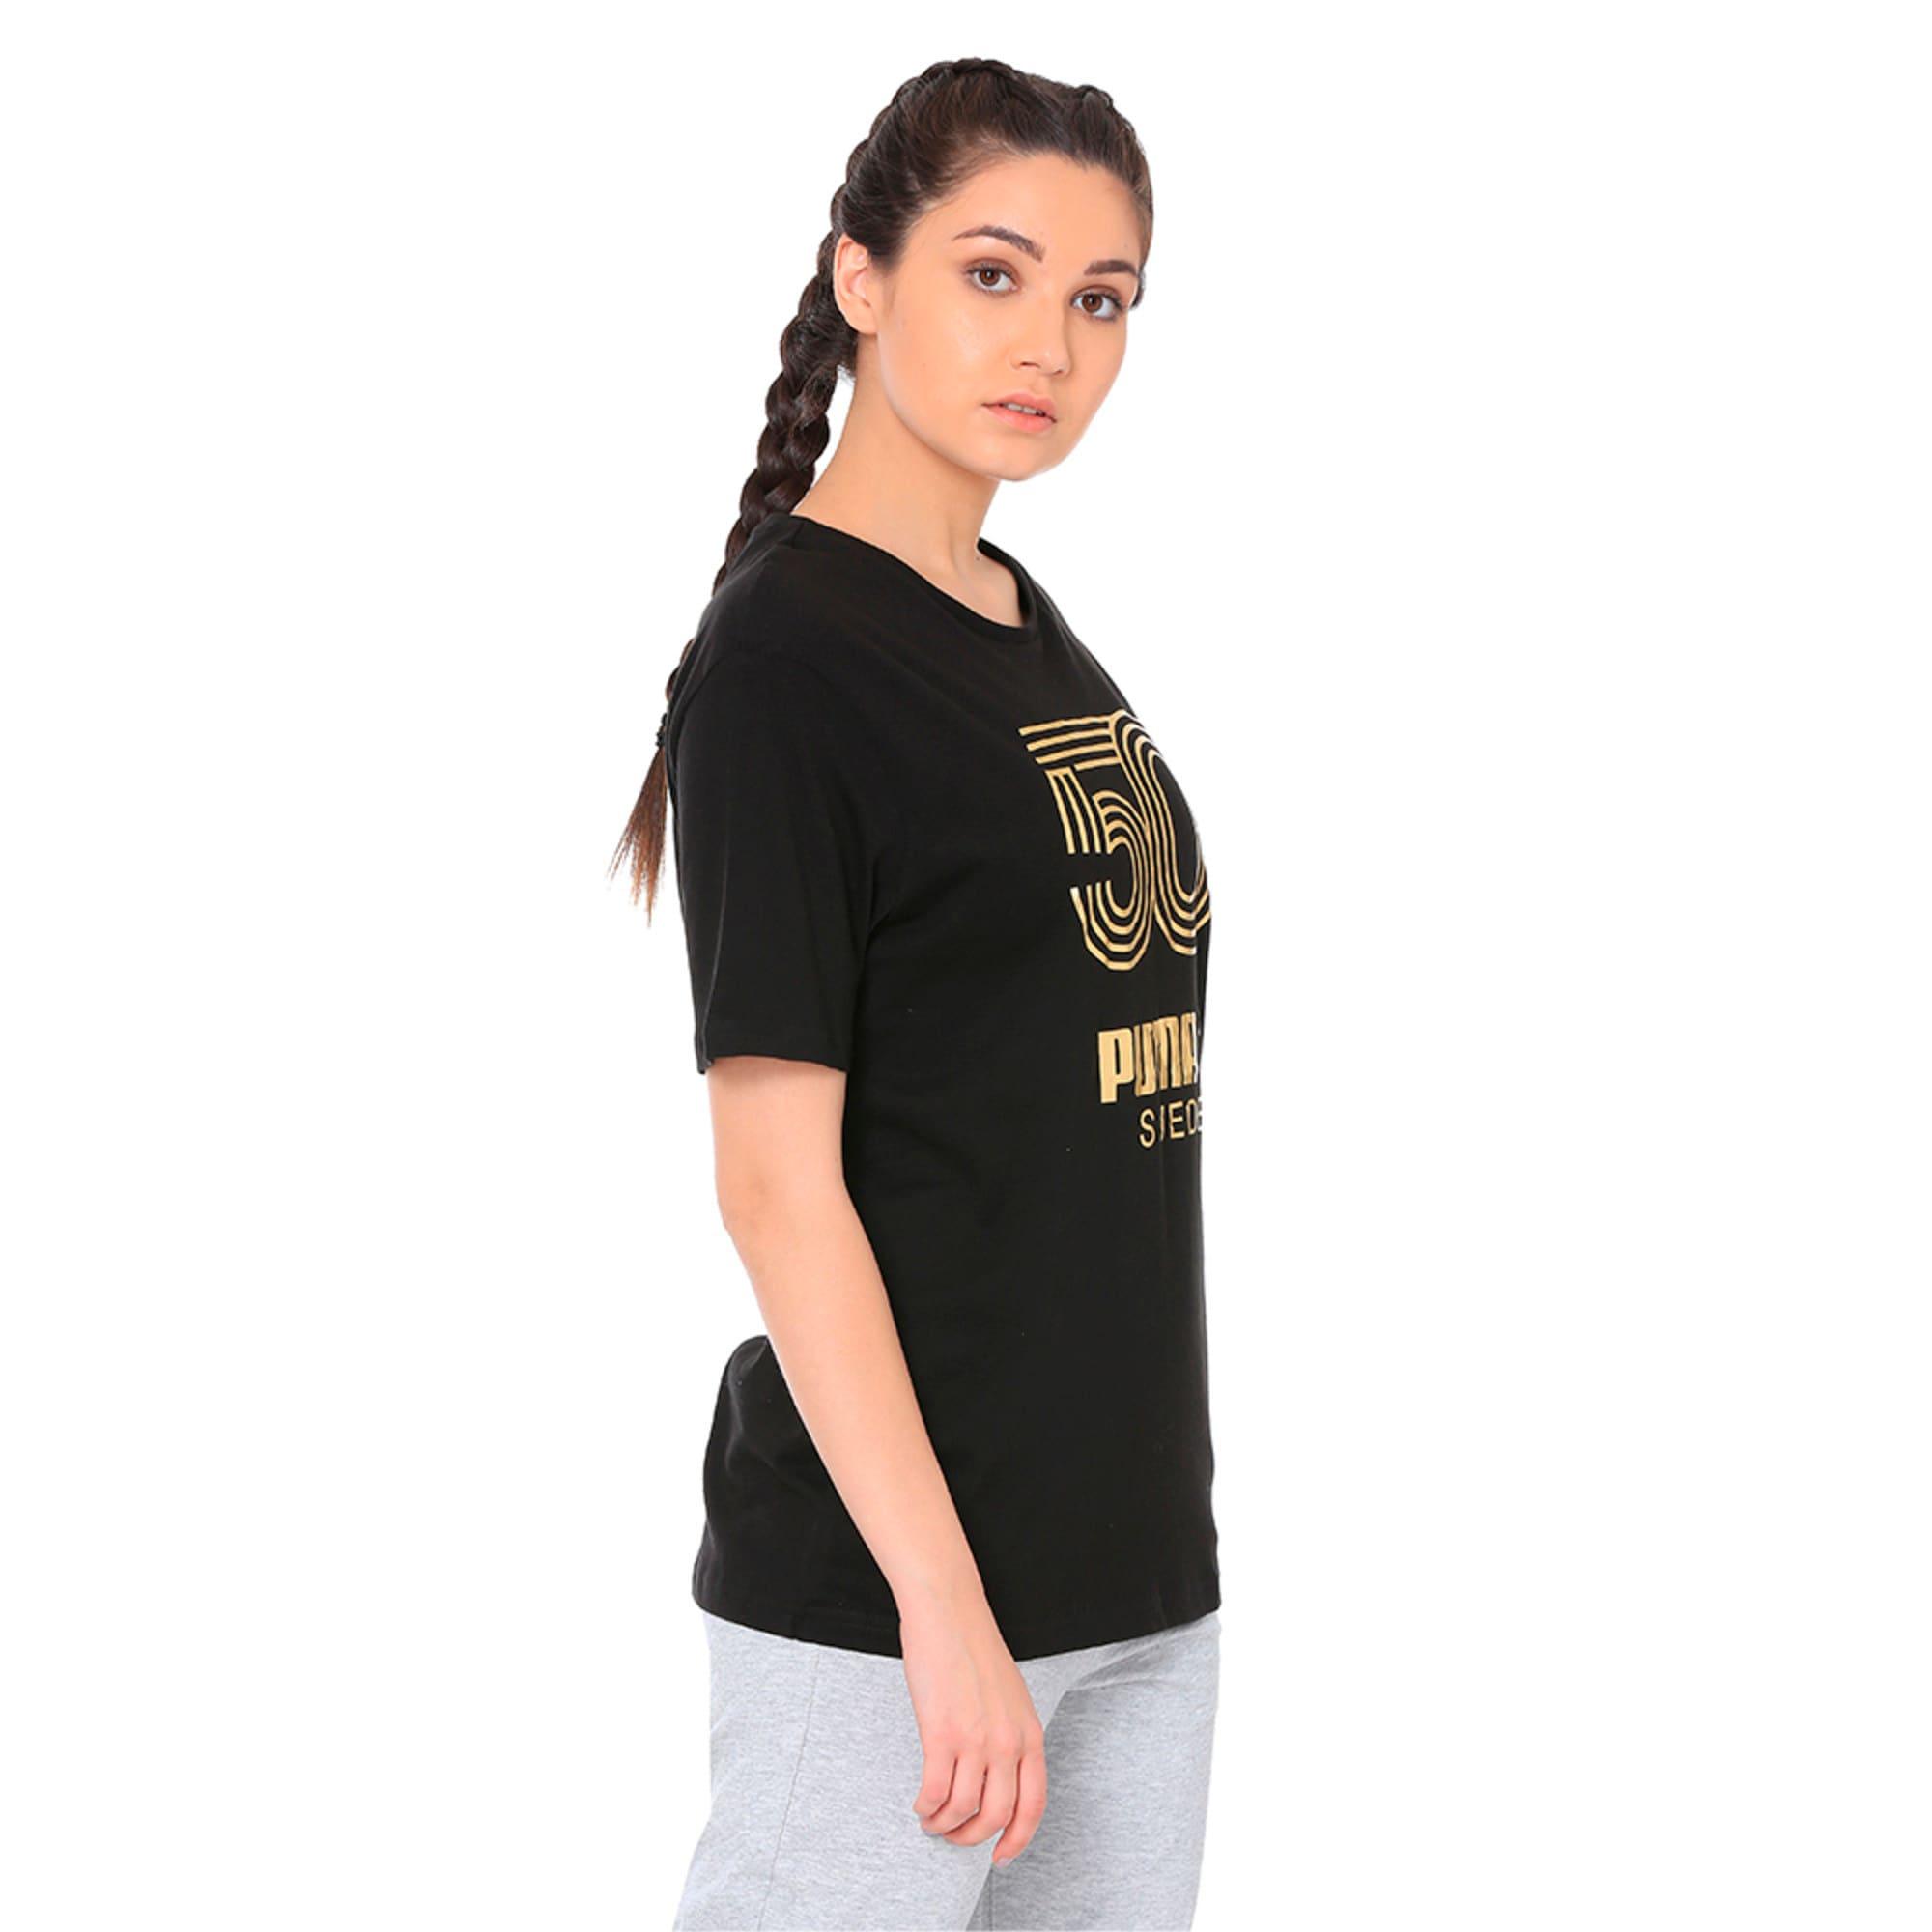 Thumbnail 4 of Women's Graphic T-shirt, Cotton Black, medium-IND